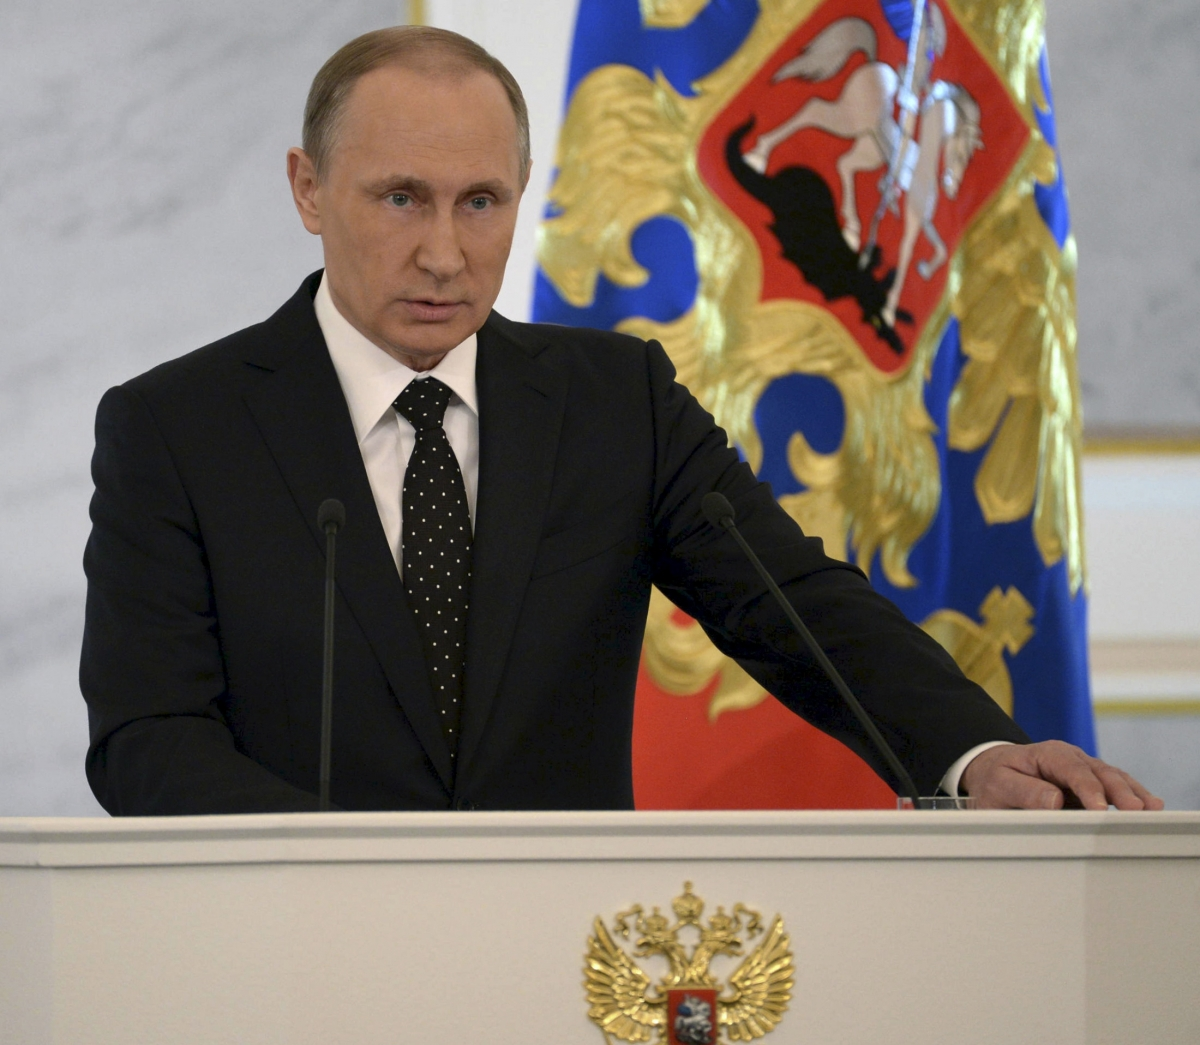 Russian President Vladimir Putin addresses the StateDuma